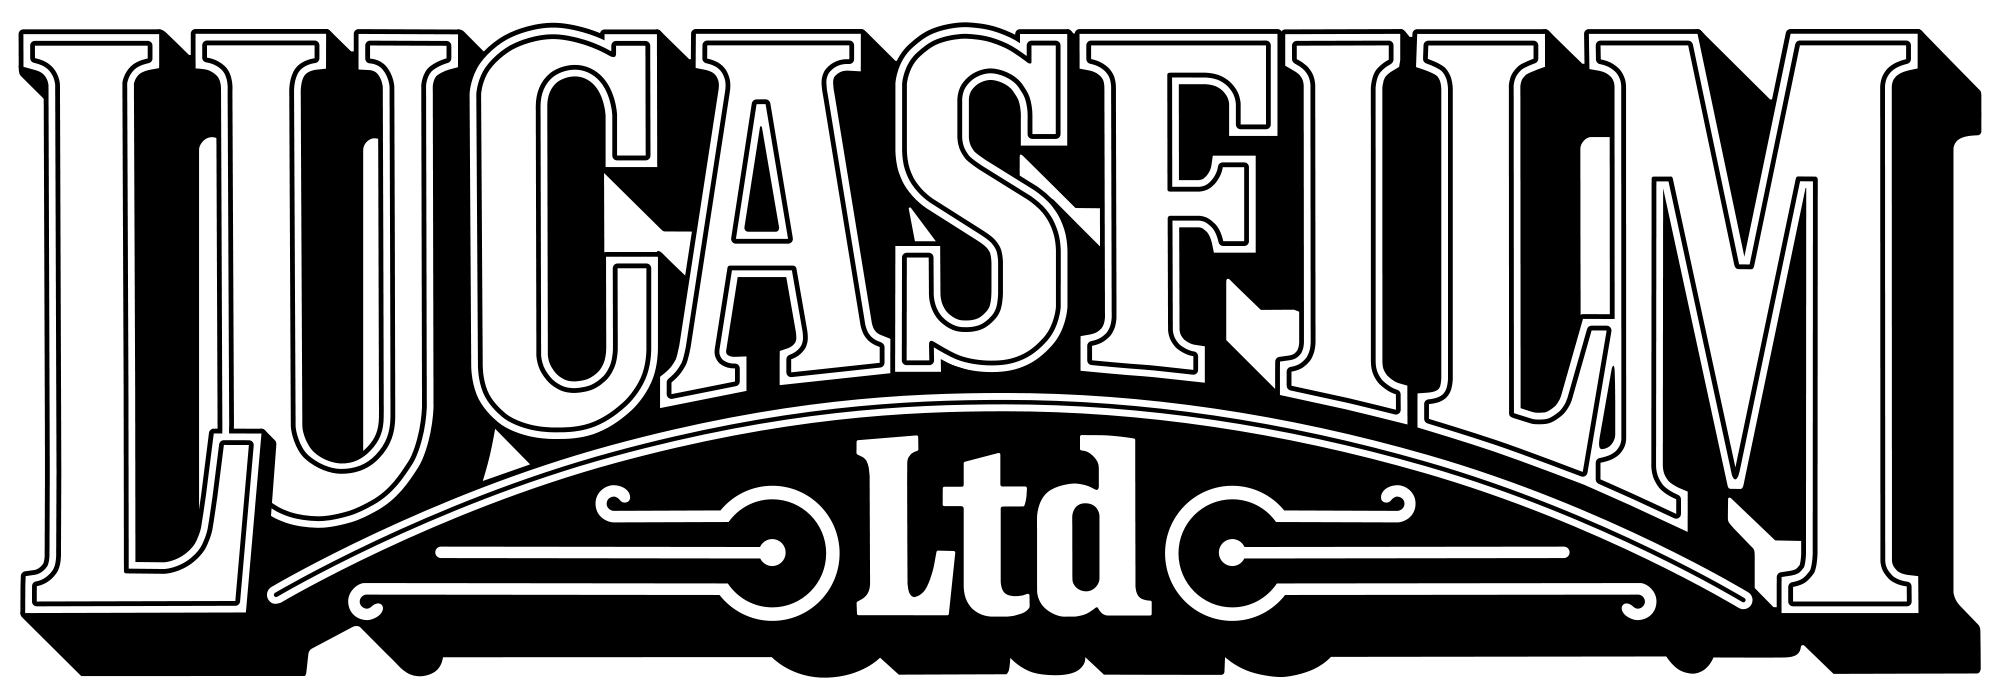 Island Computer Logo photo - 1